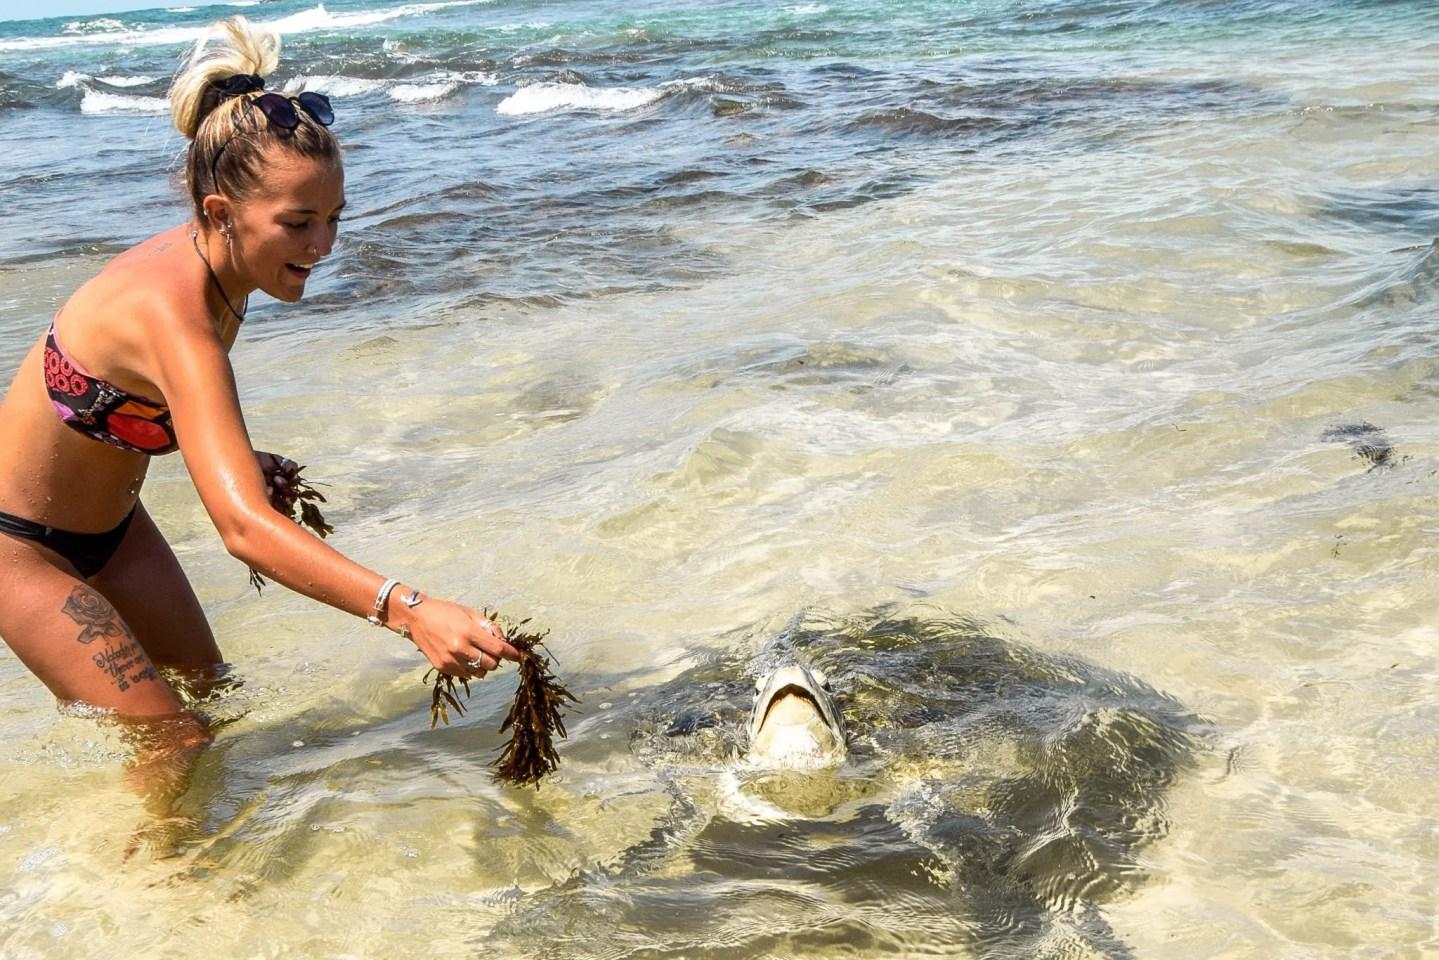 Wild Hikkaduwa Turtles & Where To Find Them